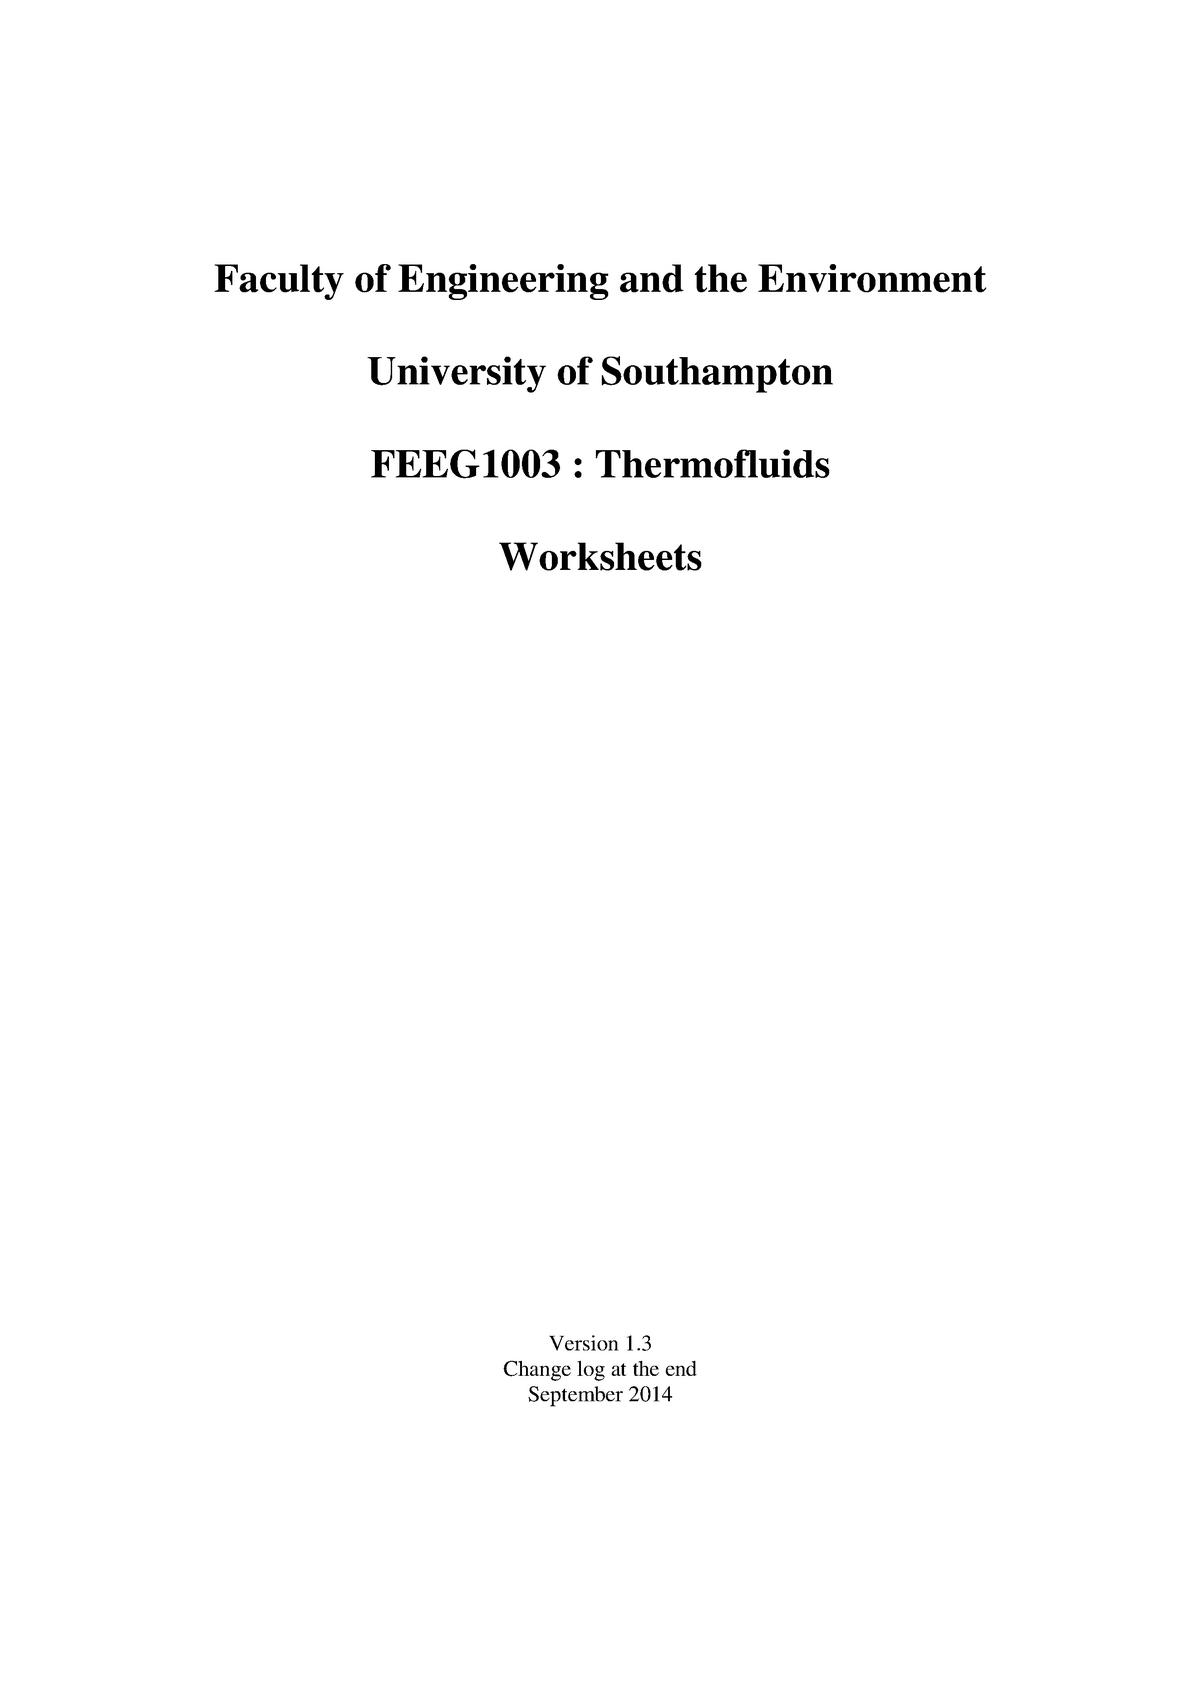 Engineering Thermofluids Thermodynamics Book